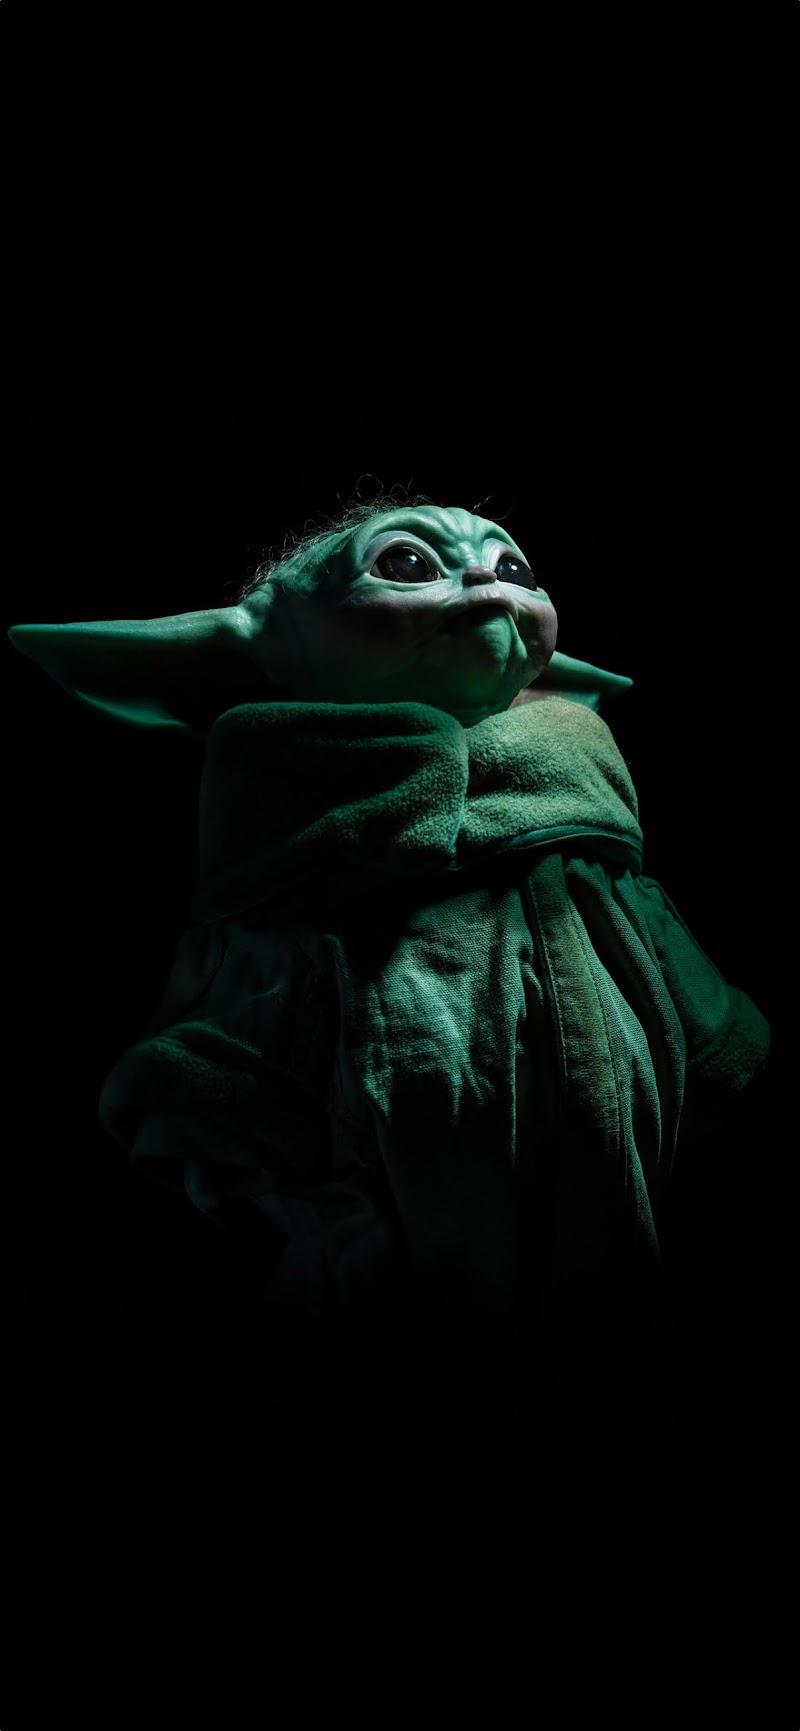 3 Beautiful Baby Yoda Grogu iPhone Wallpapers The Mandalorian 4K ( Star wars )